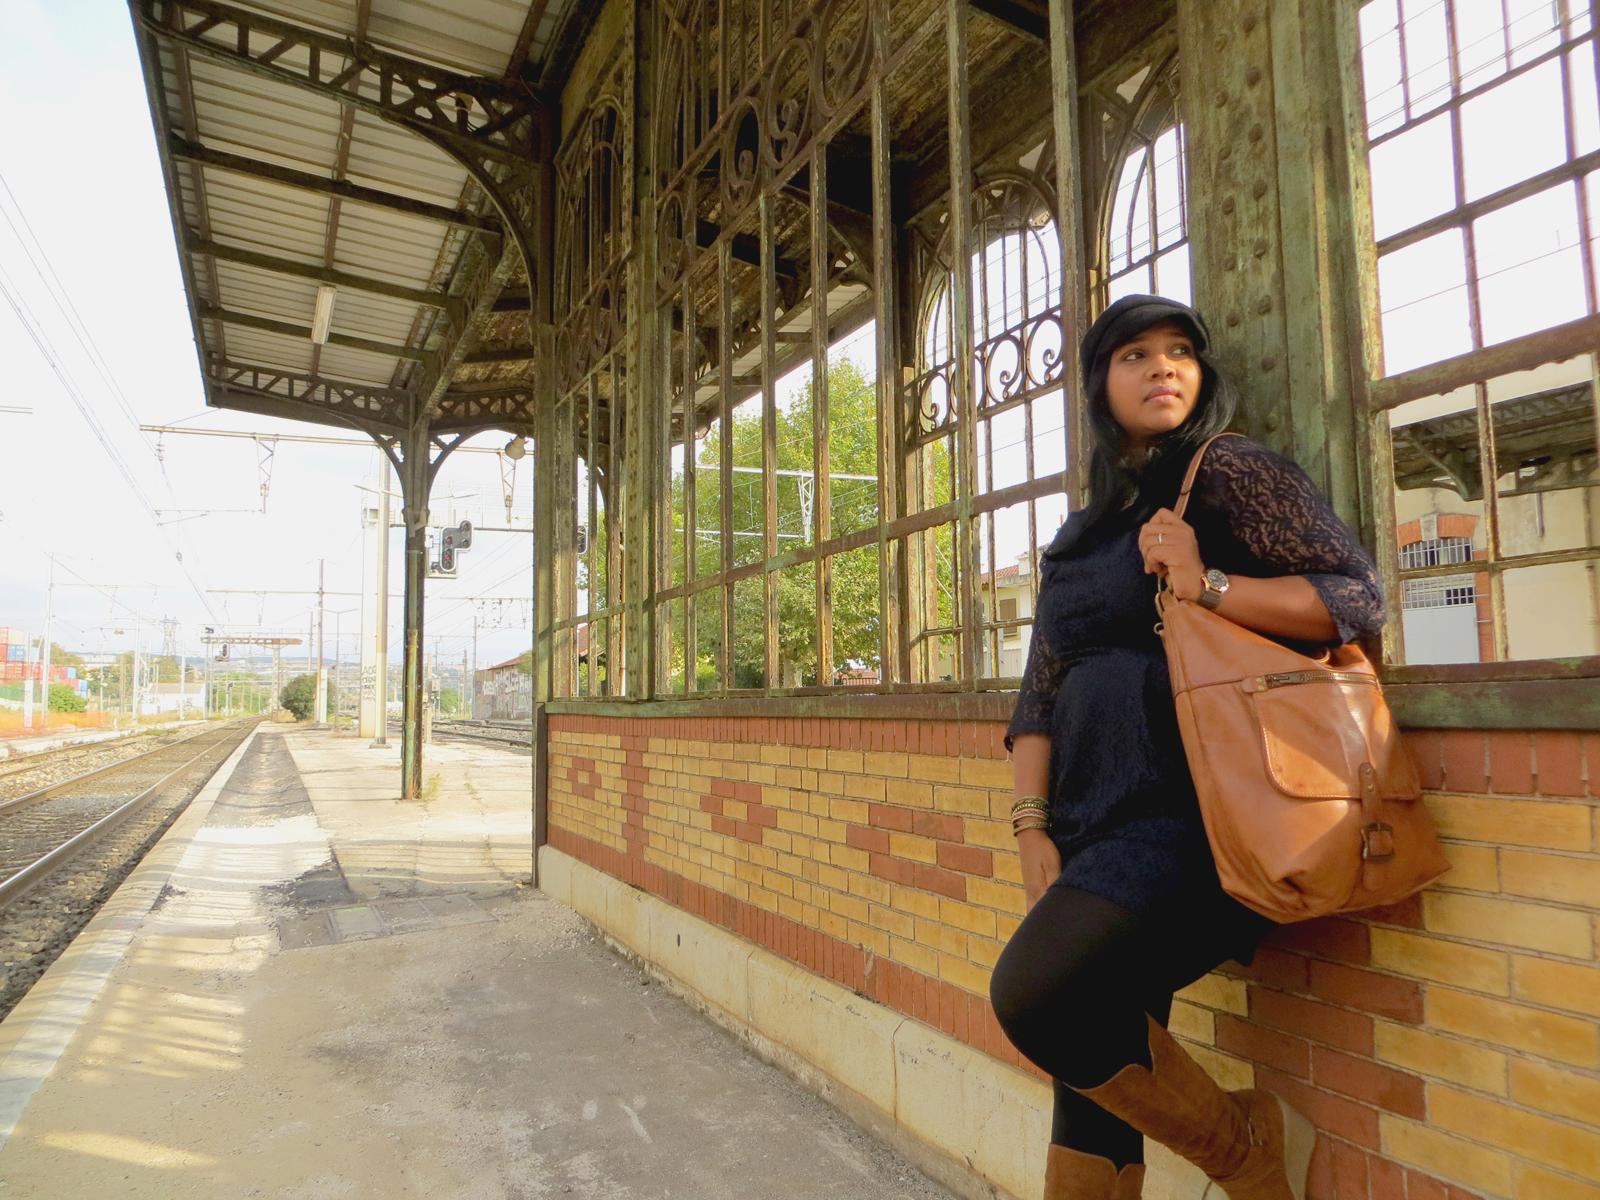 Hema_Waiting_for_the_train_C-Oui-Copenhague5